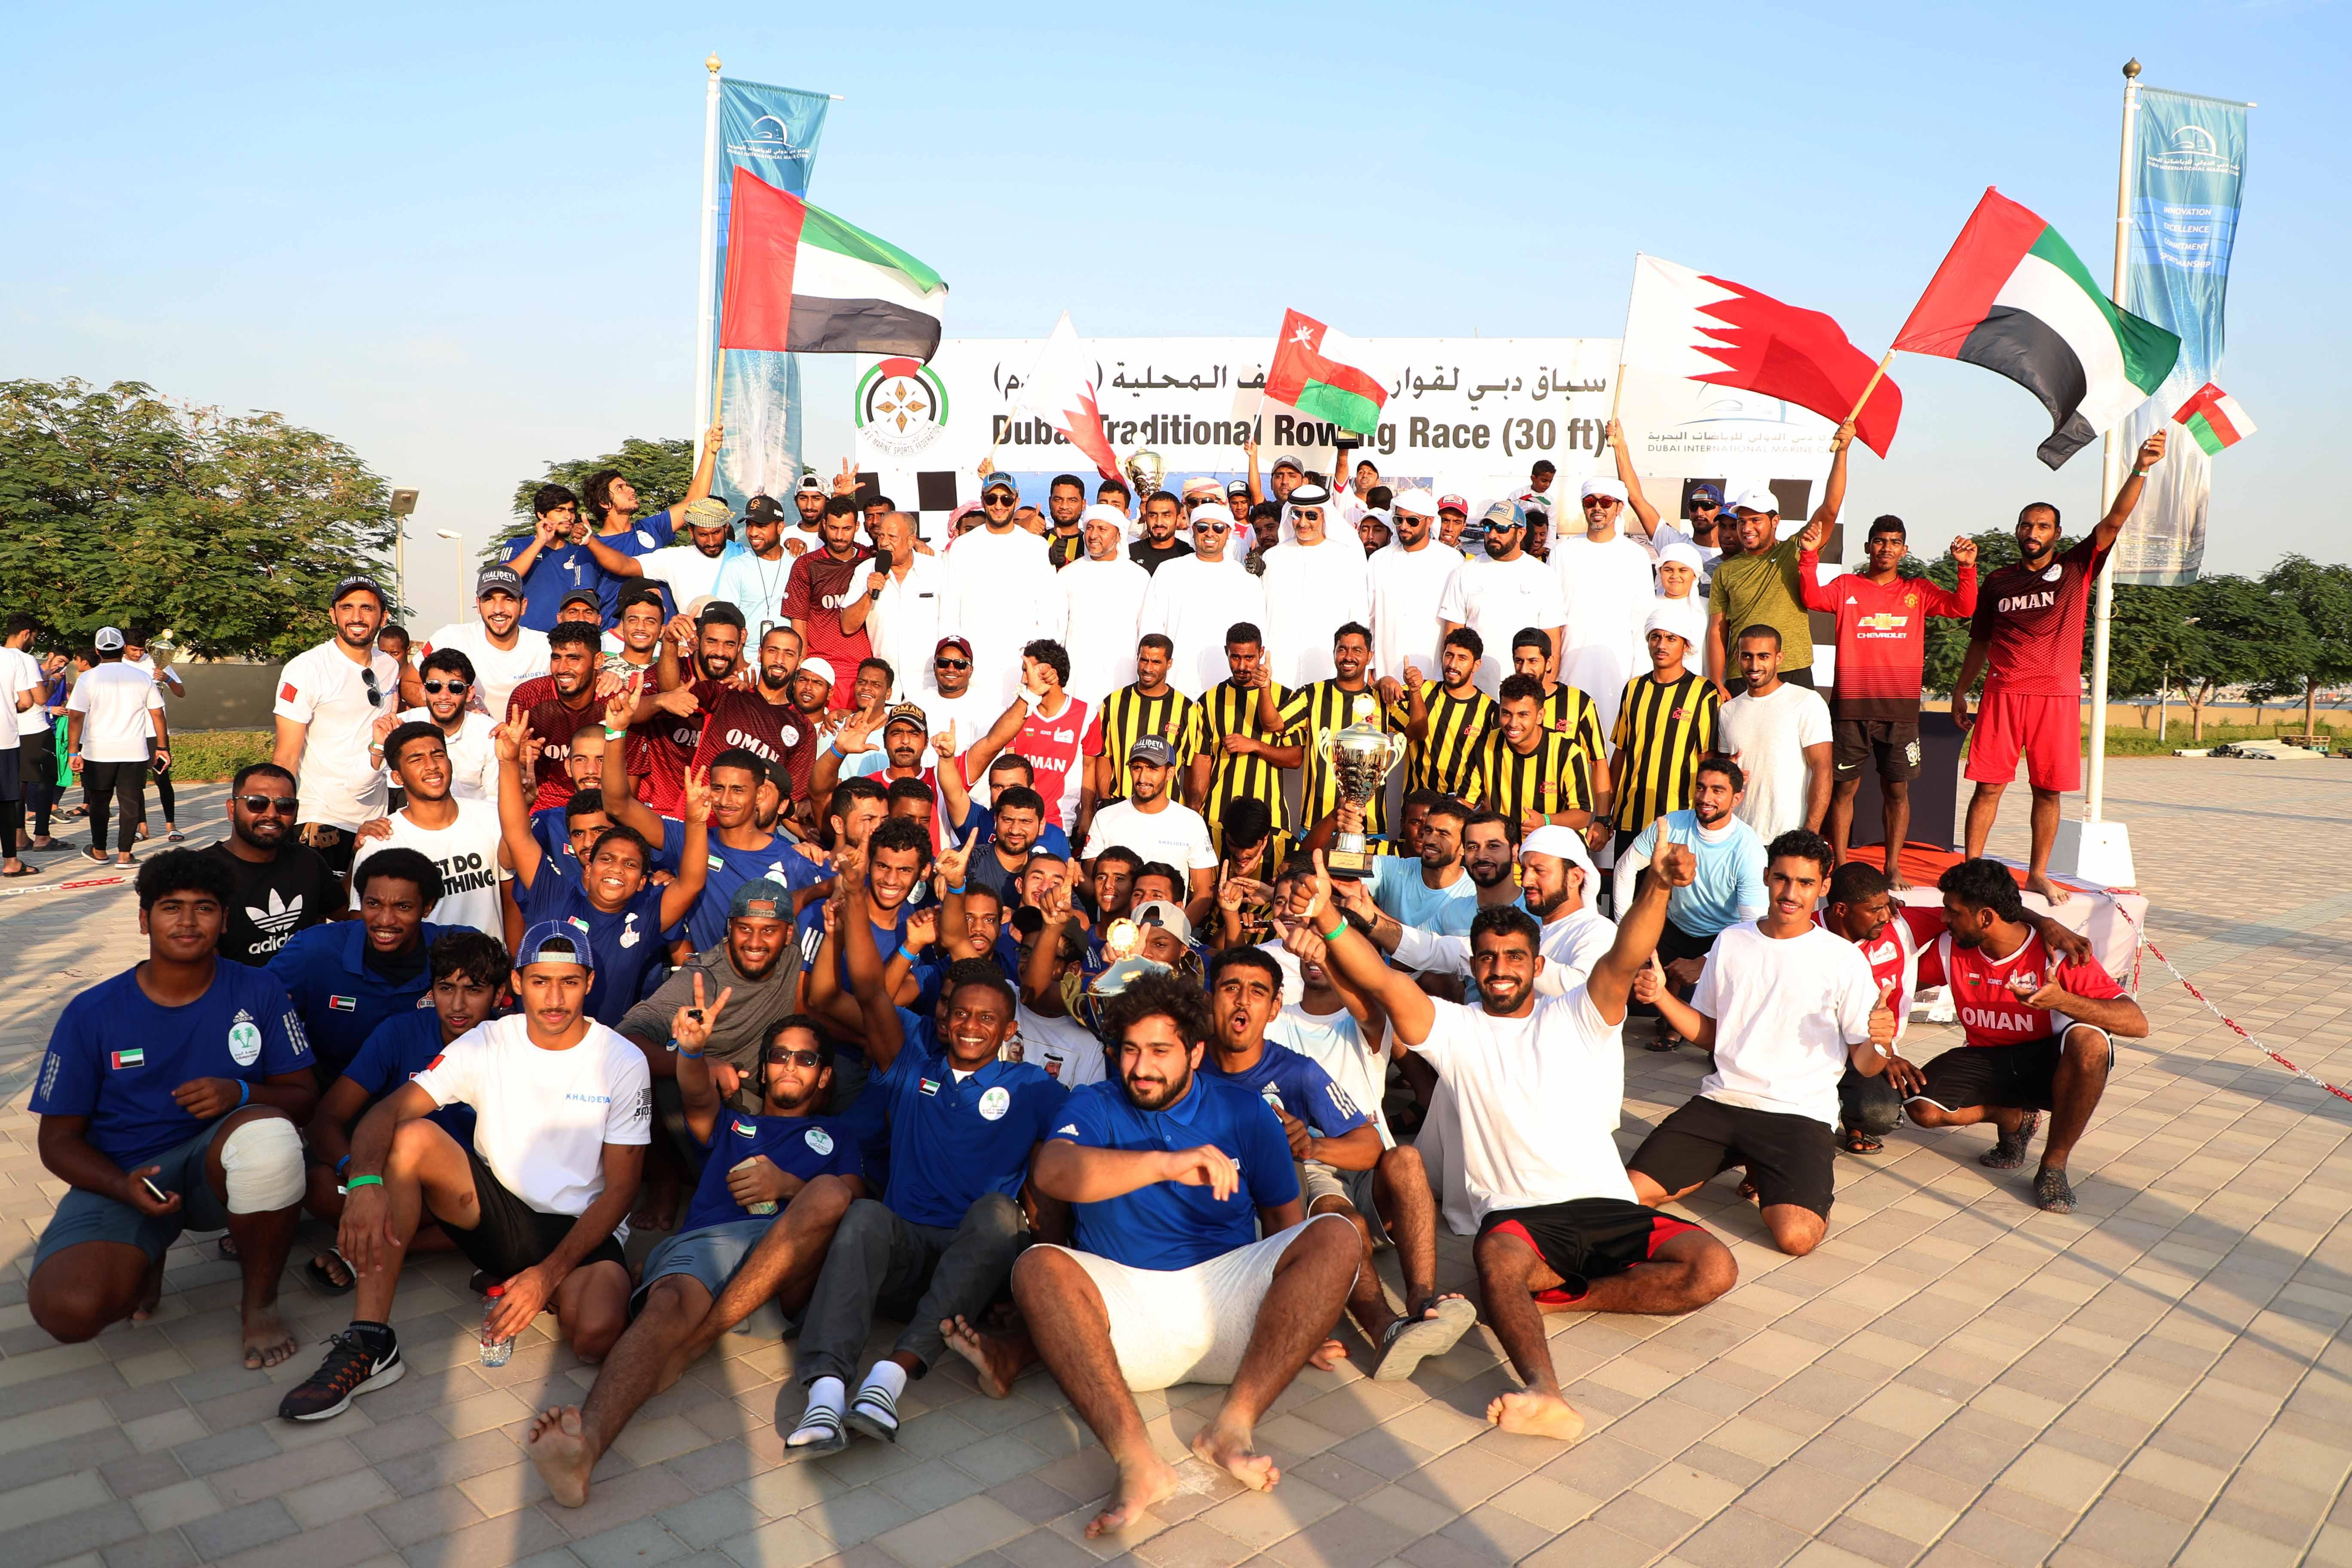 Al Tayar 60 and Oman 44 Champion of the Rowing Race - Heat 2